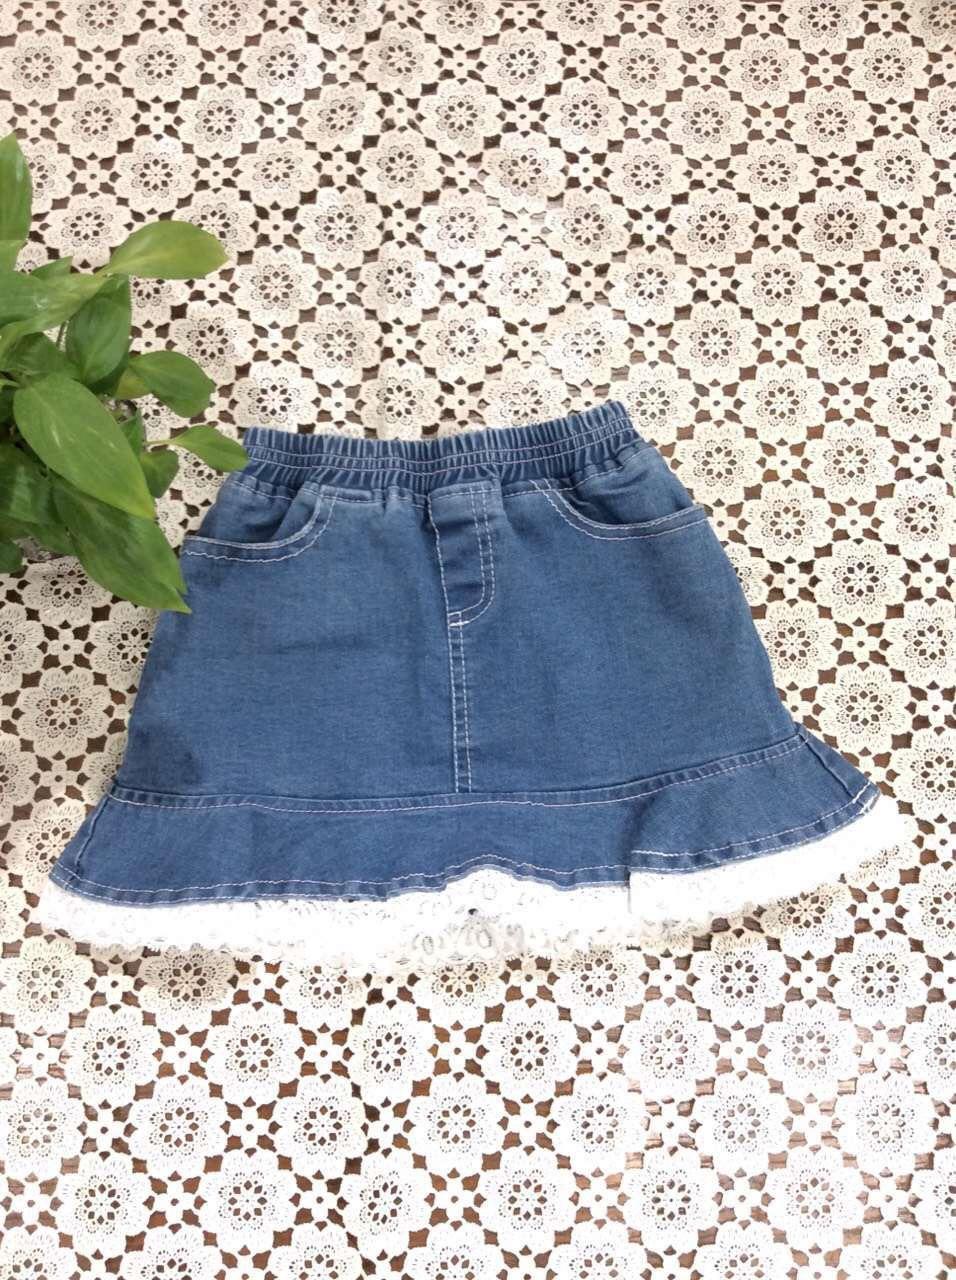 2016 Baby Girls Denim Lace skirts Babies Spring Wash Blue Skirt Kids Girl Fashion Jean Mini Skirt Childrens Clothing<br><br>Aliexpress